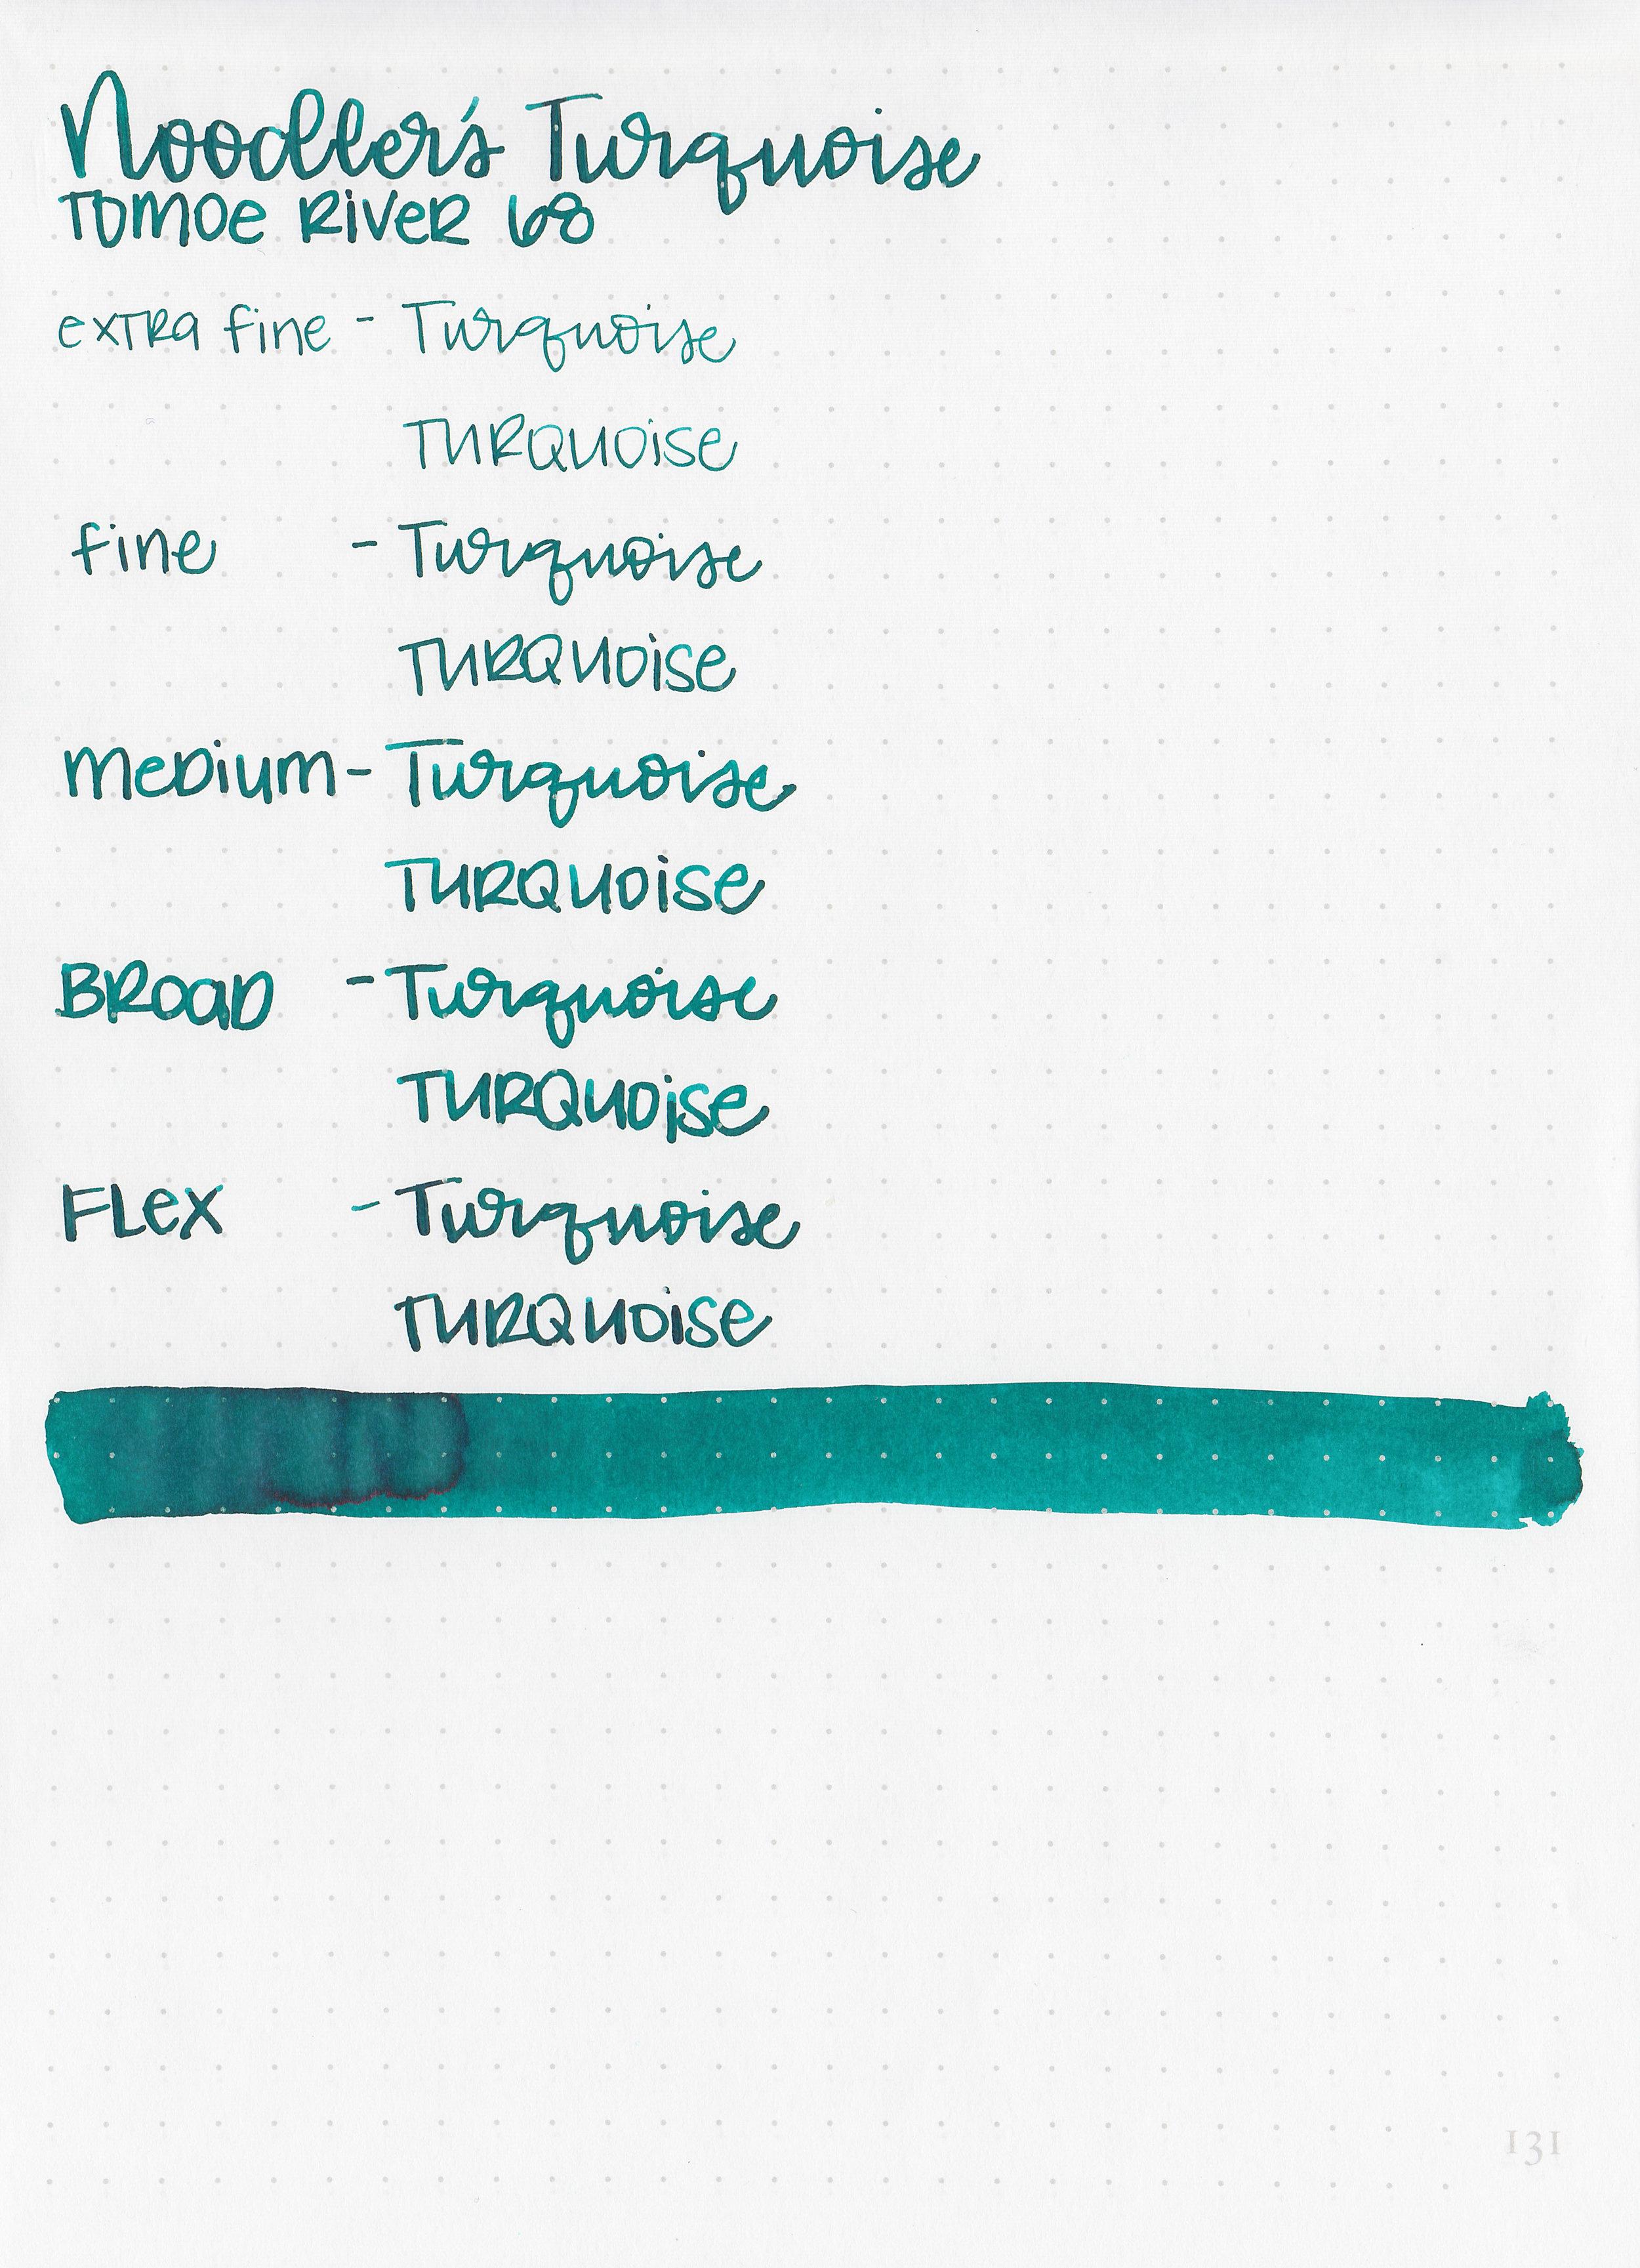 nood-turquoise-7.jpg